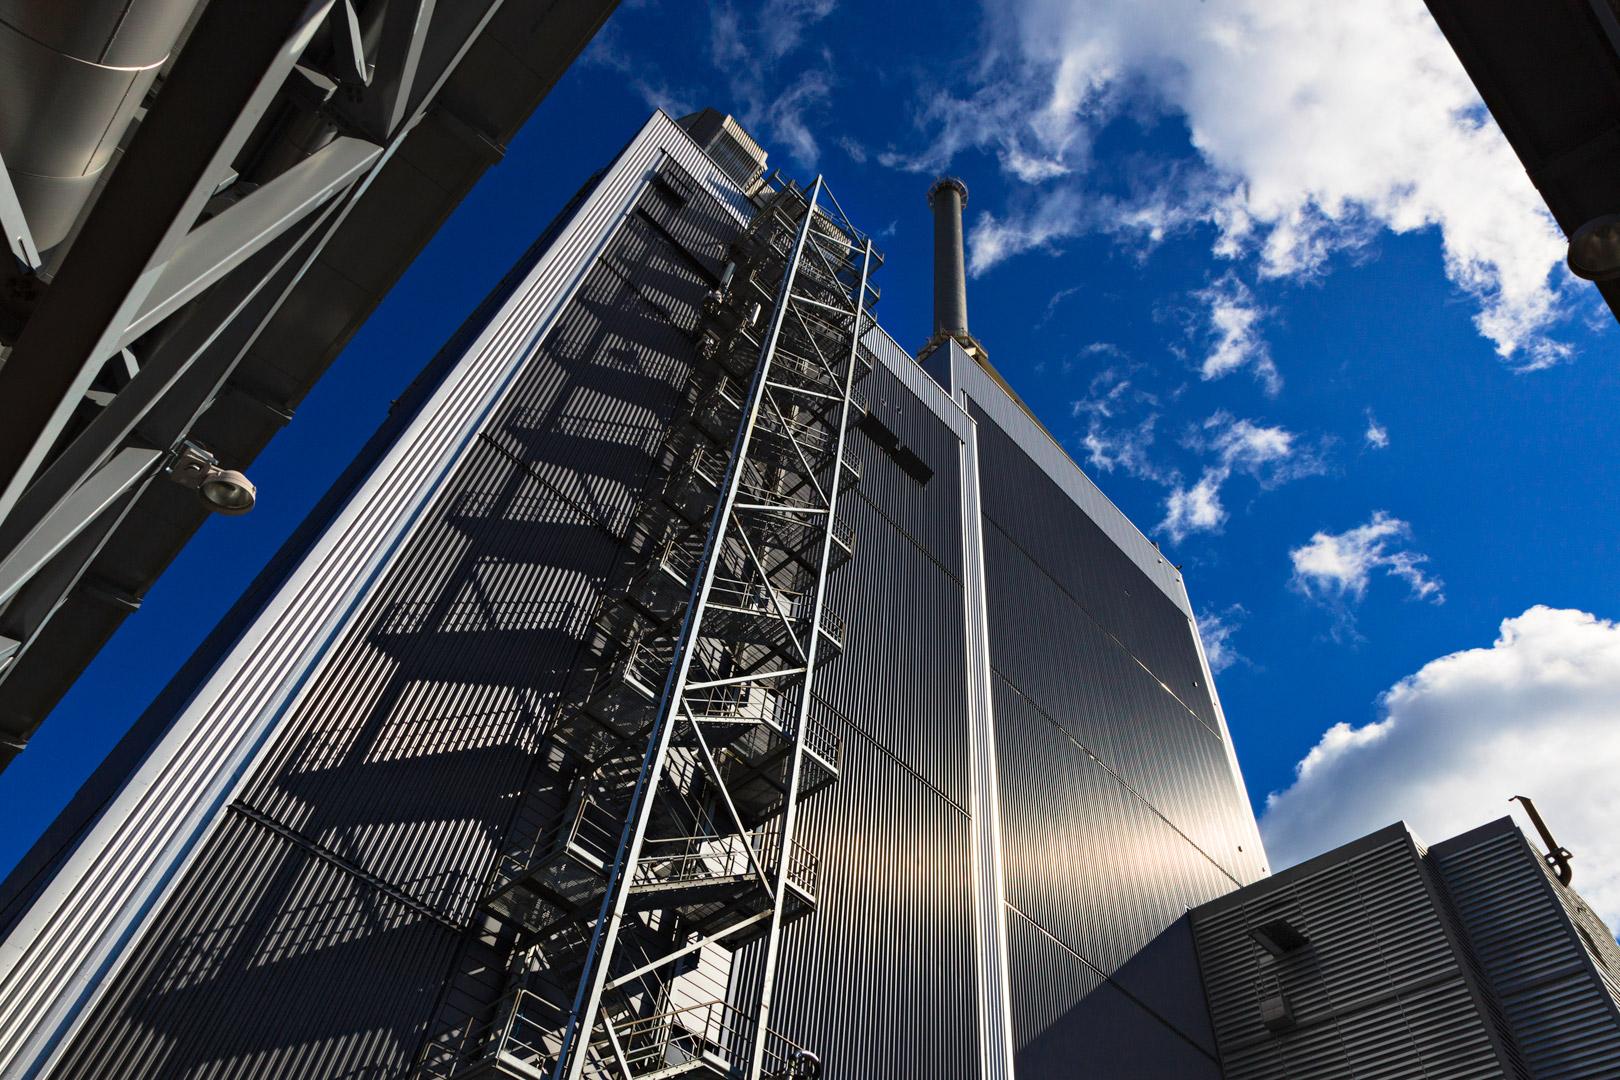 Lahti Energian kaasuvoimalaitos